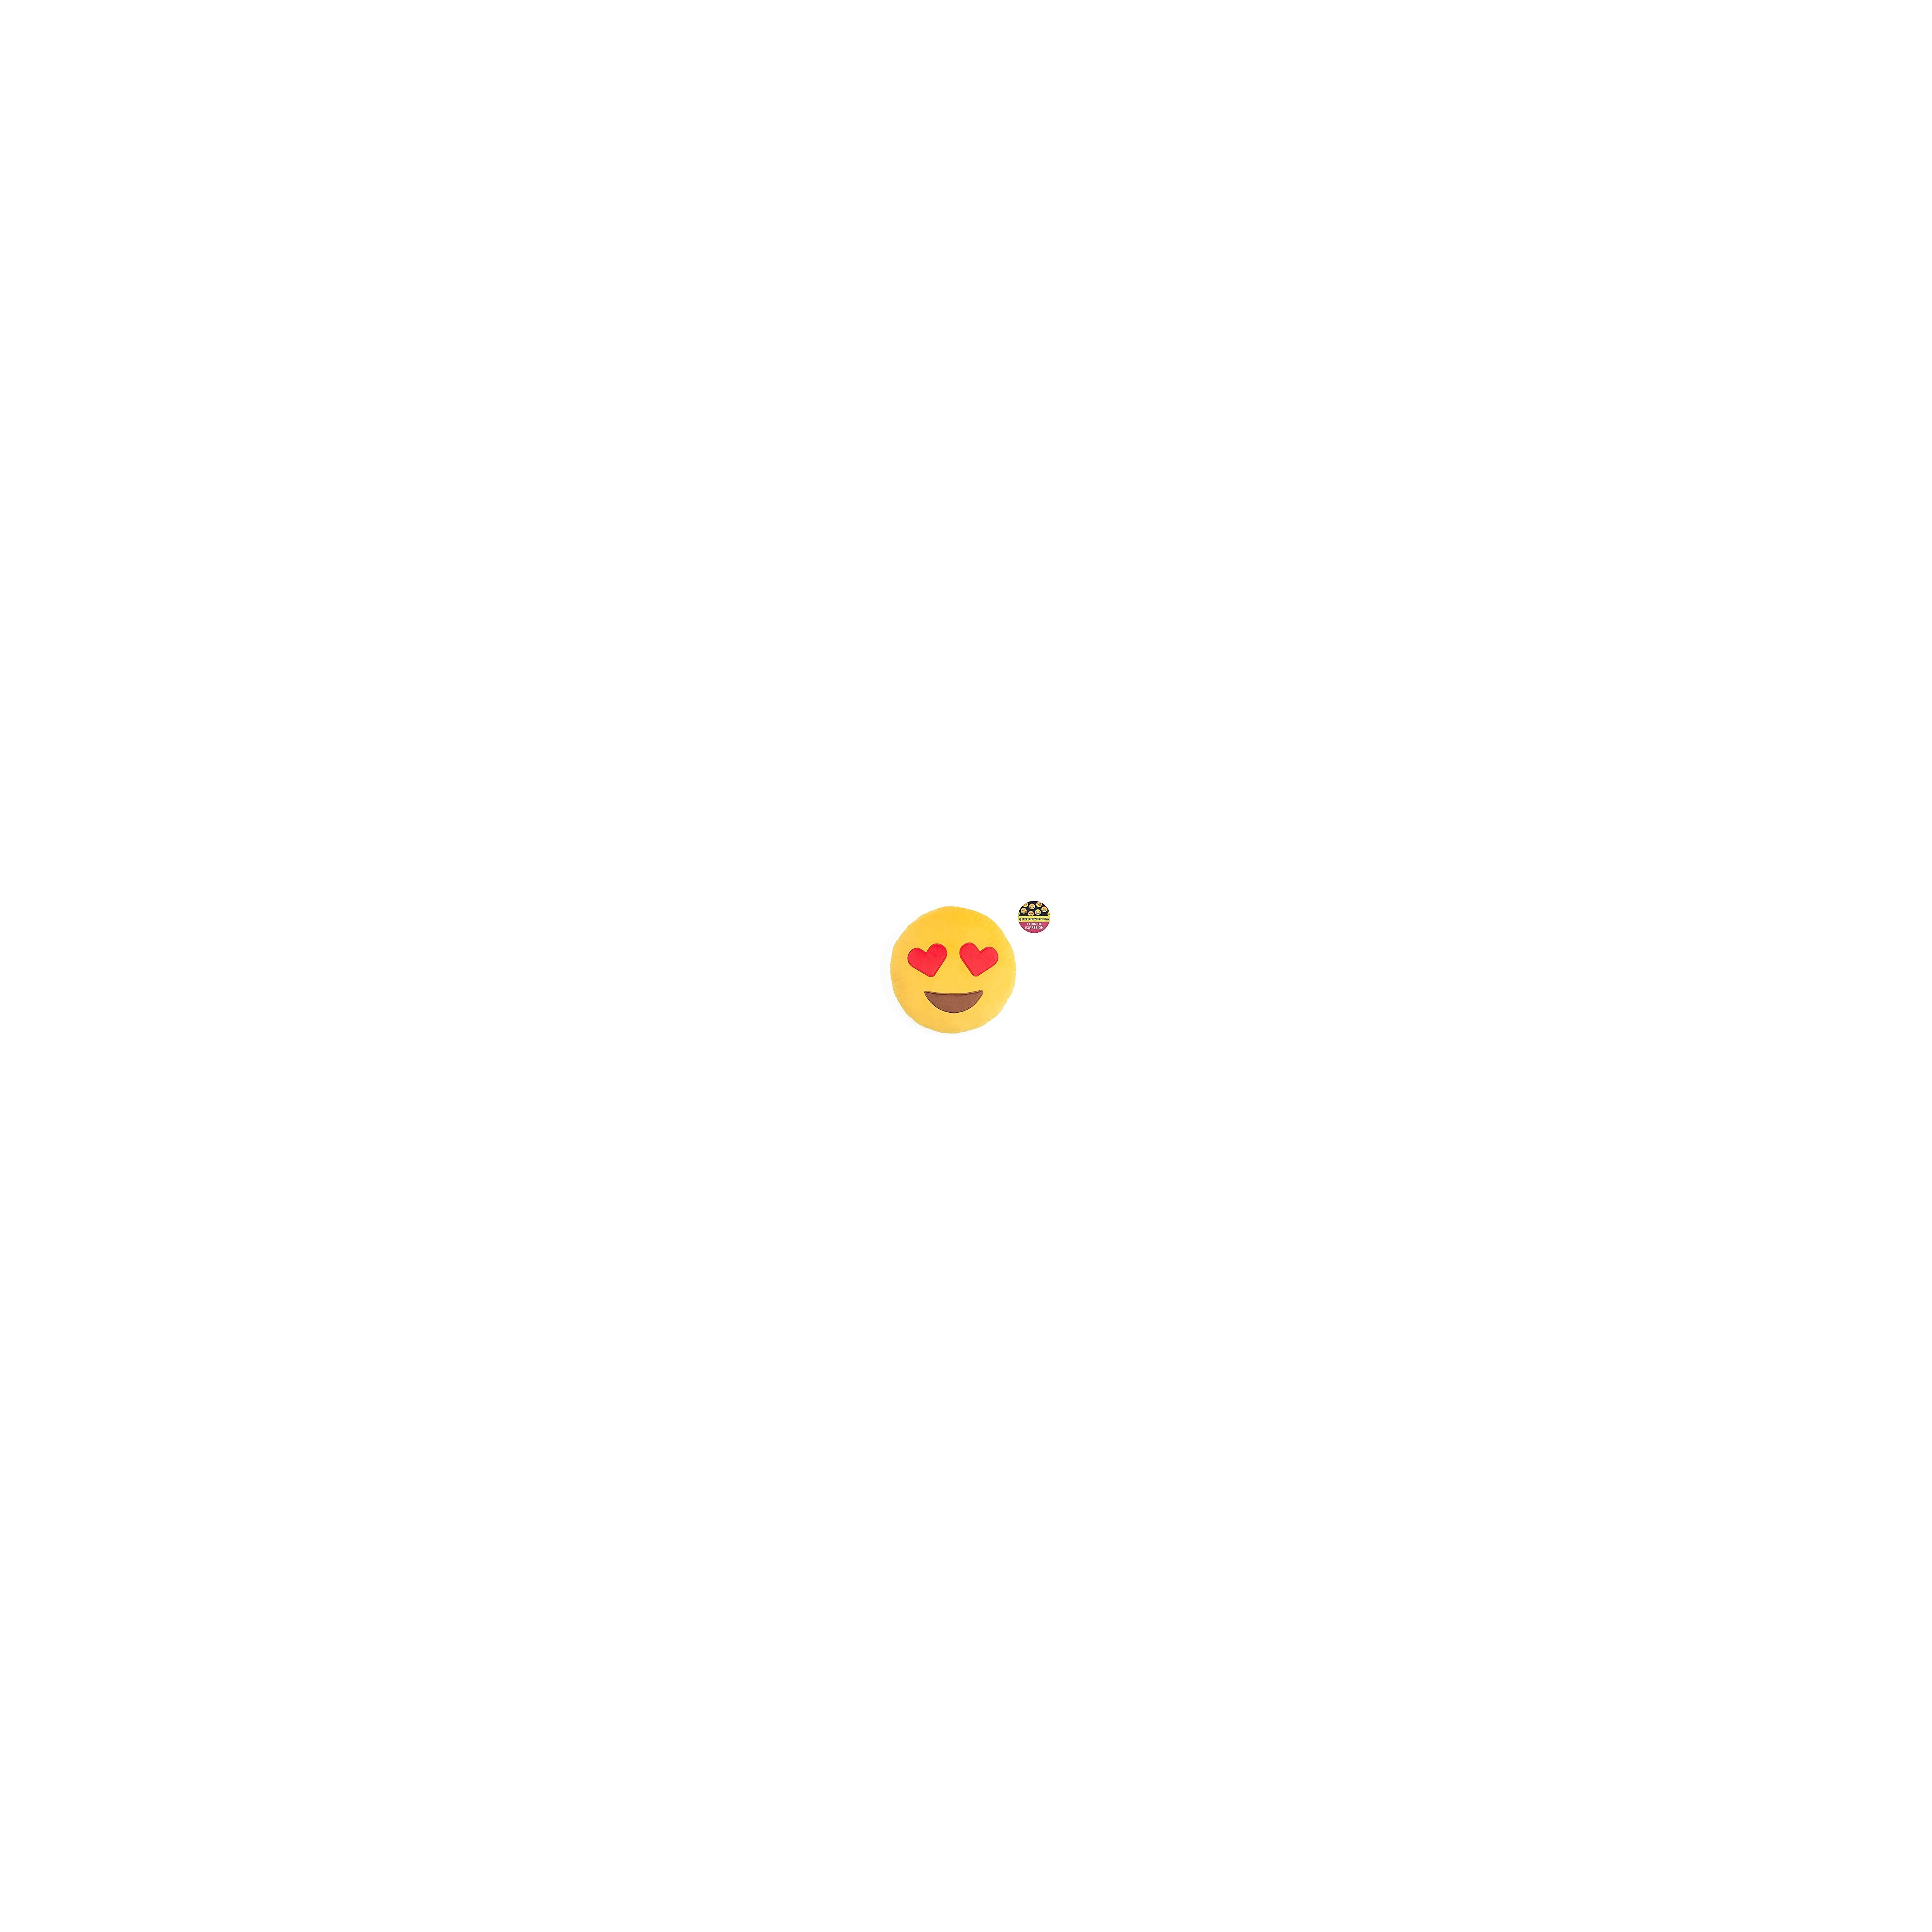 Q's 32cm/13IN Emoji Smiley Emoticon Yellow Round Cushion Pillow Stuffed Plush Soft Toy USA Best Quality